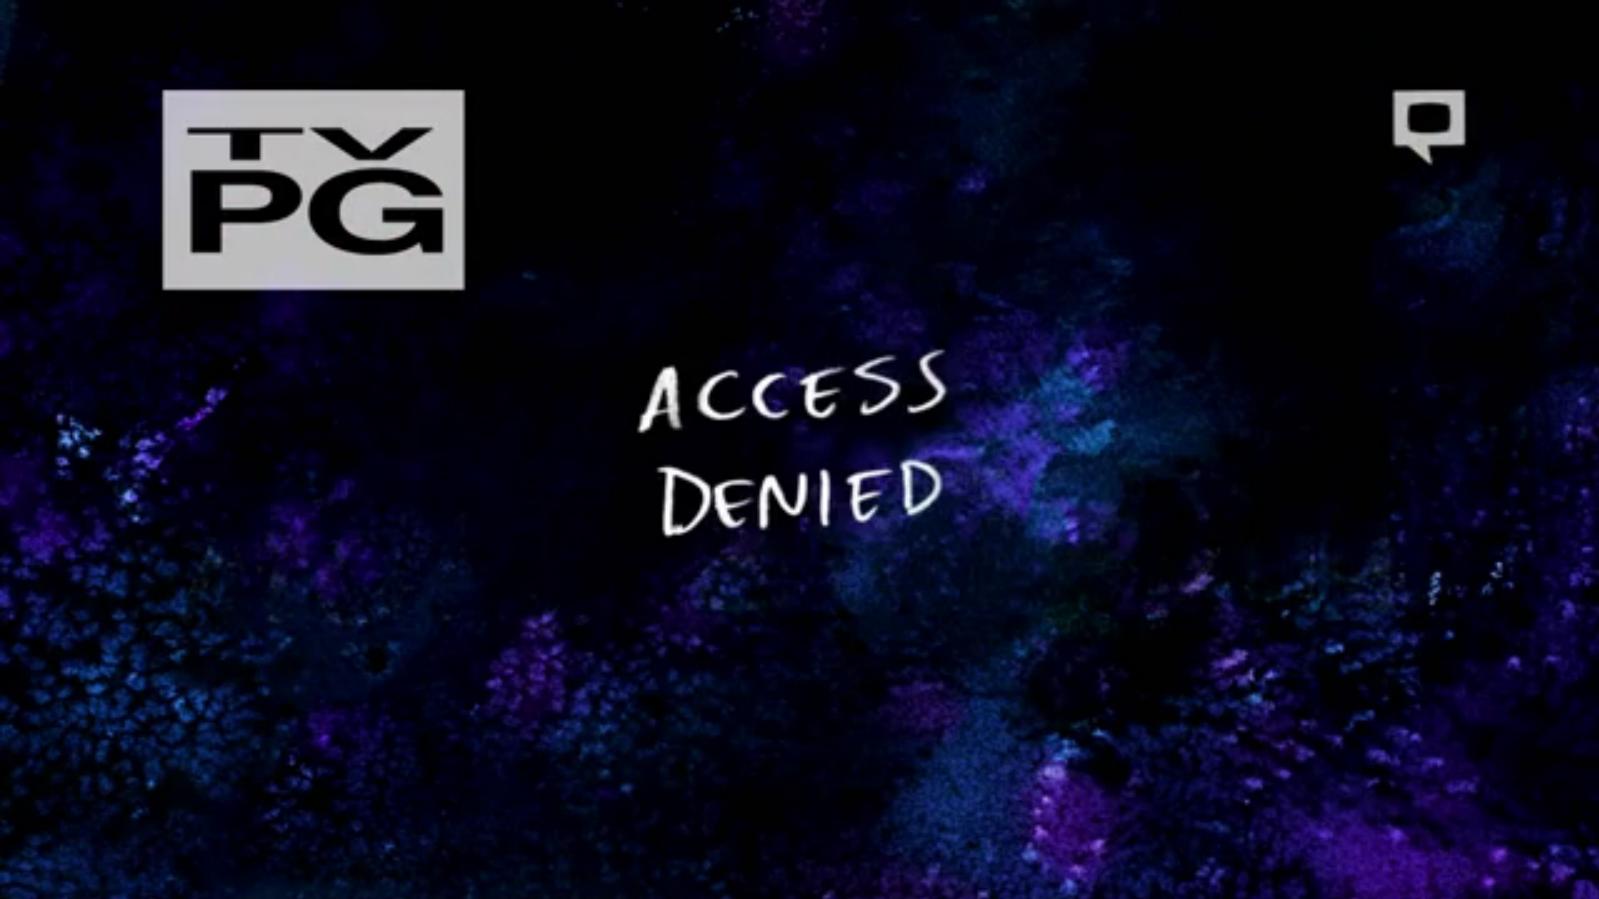 Access denied swlb-403 жж - a1